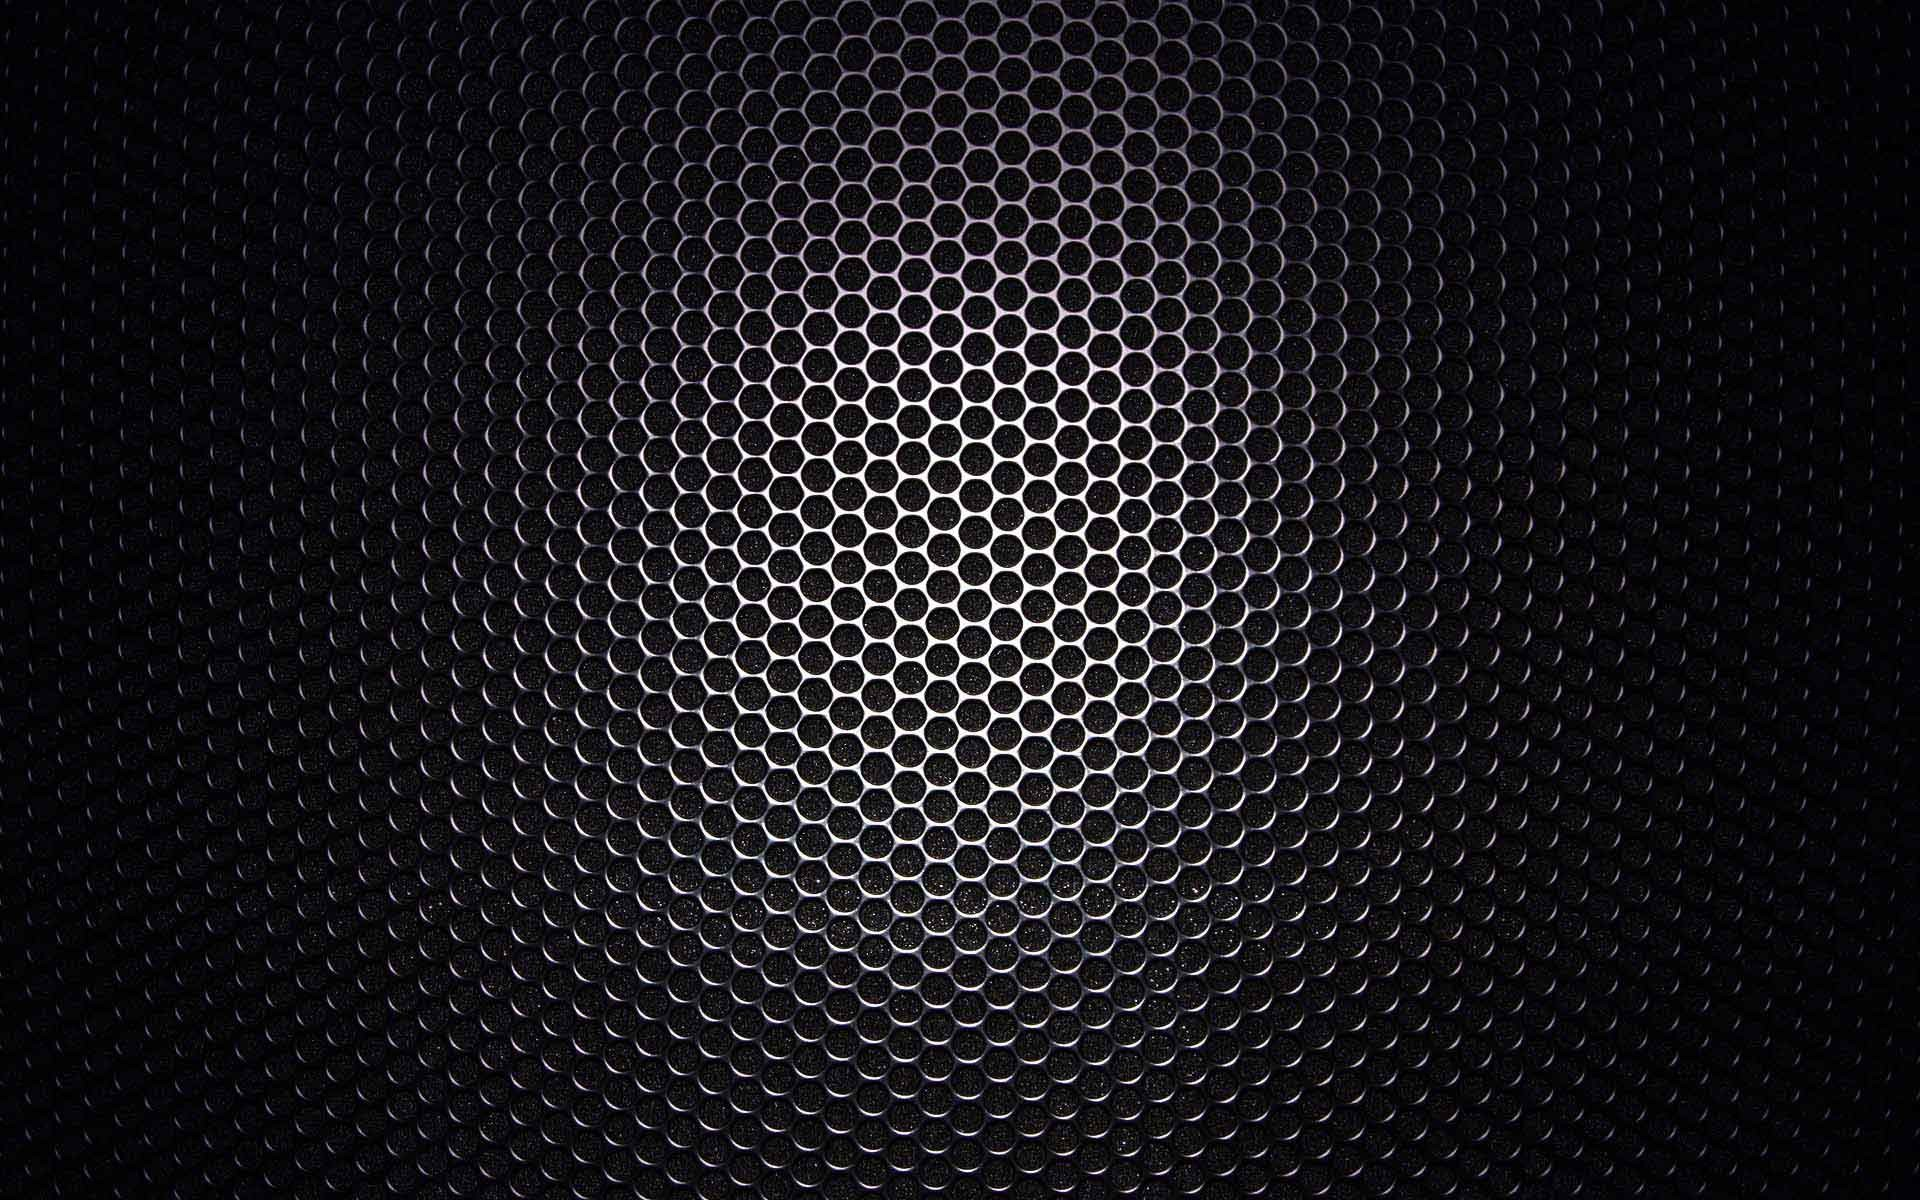 Black Wallpaper 25